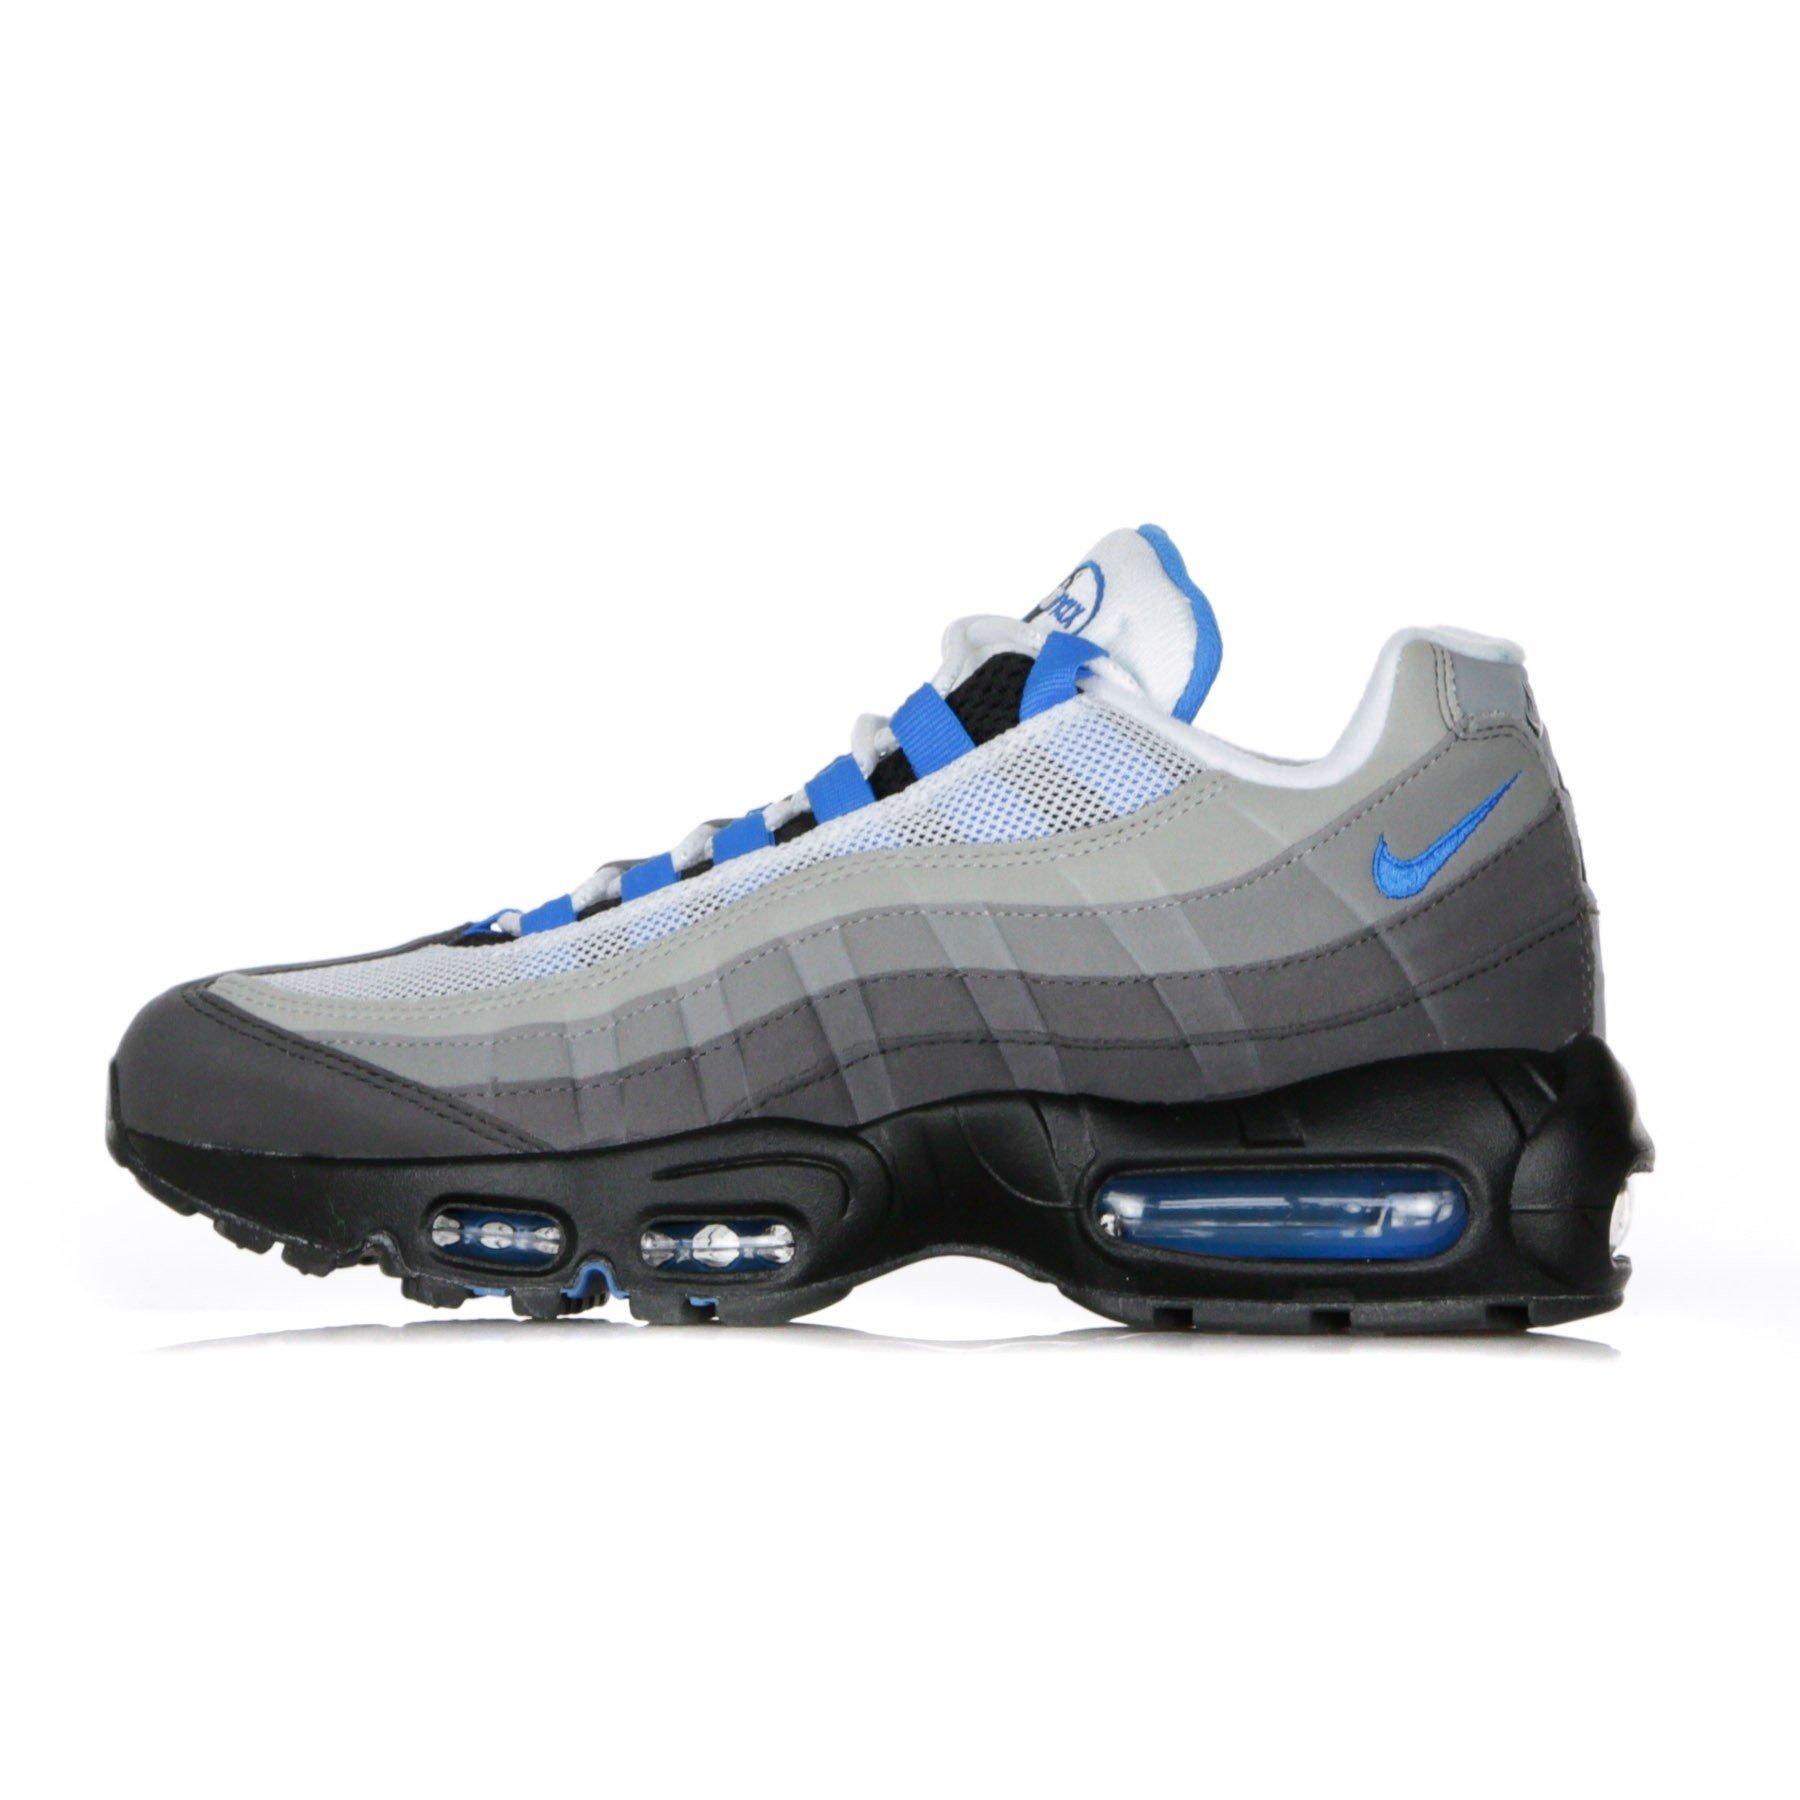 Nike uomo air max 95 AT8696-100   Atipicishop.com